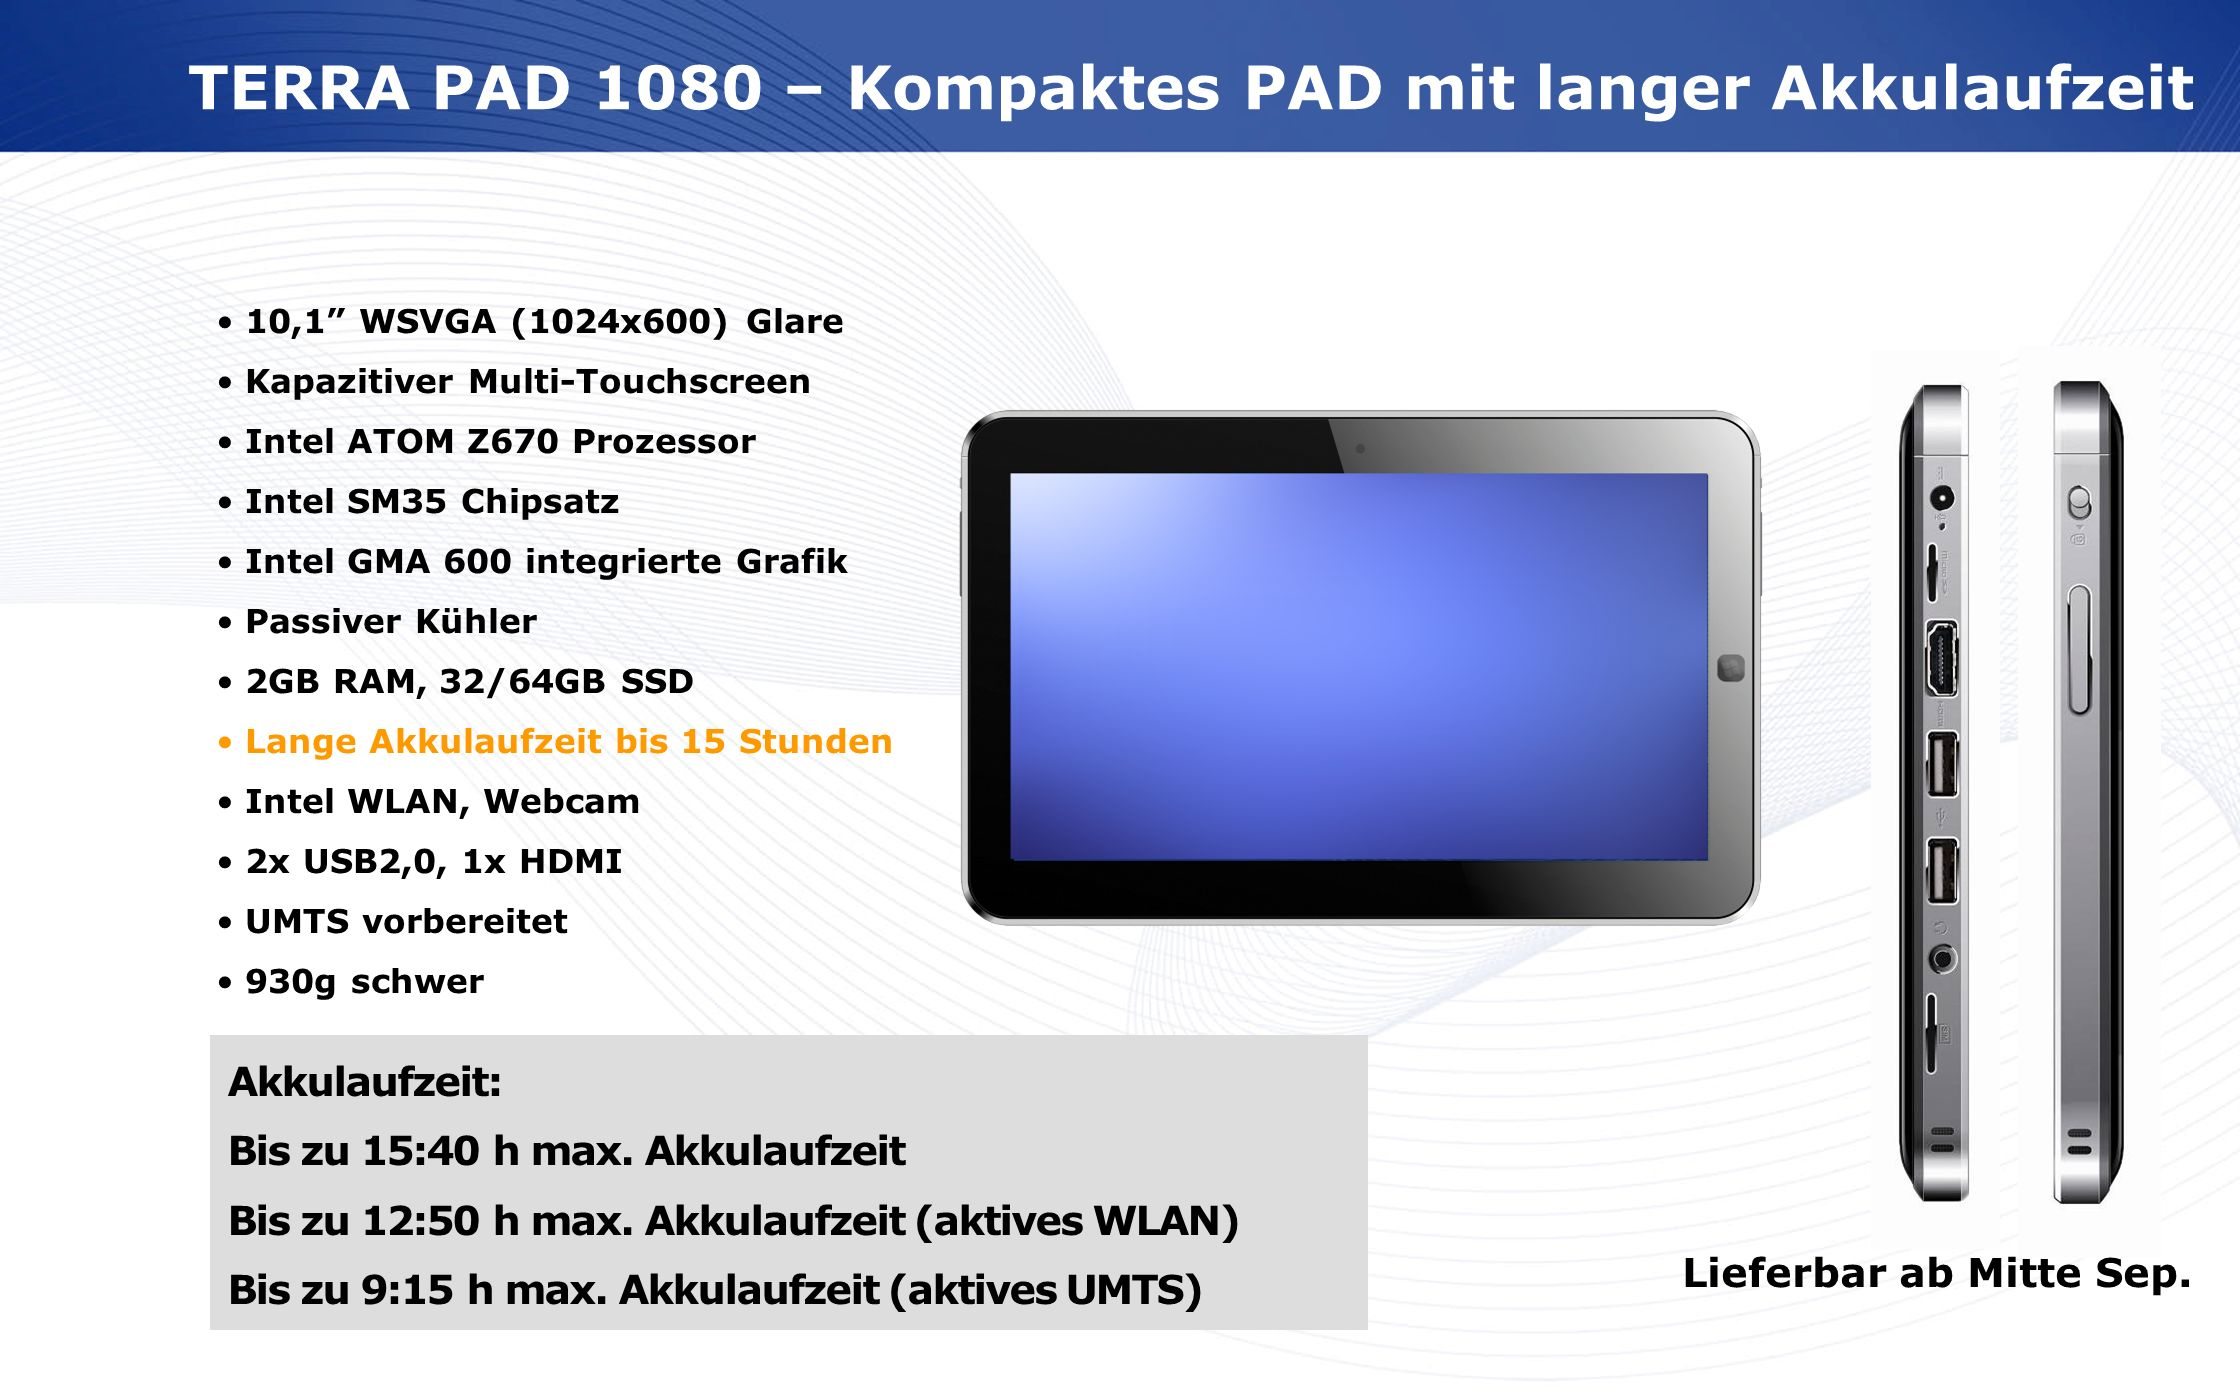 TERRA PAD 1080 – Kompaktes PAD mit langer Akkulaufzeit